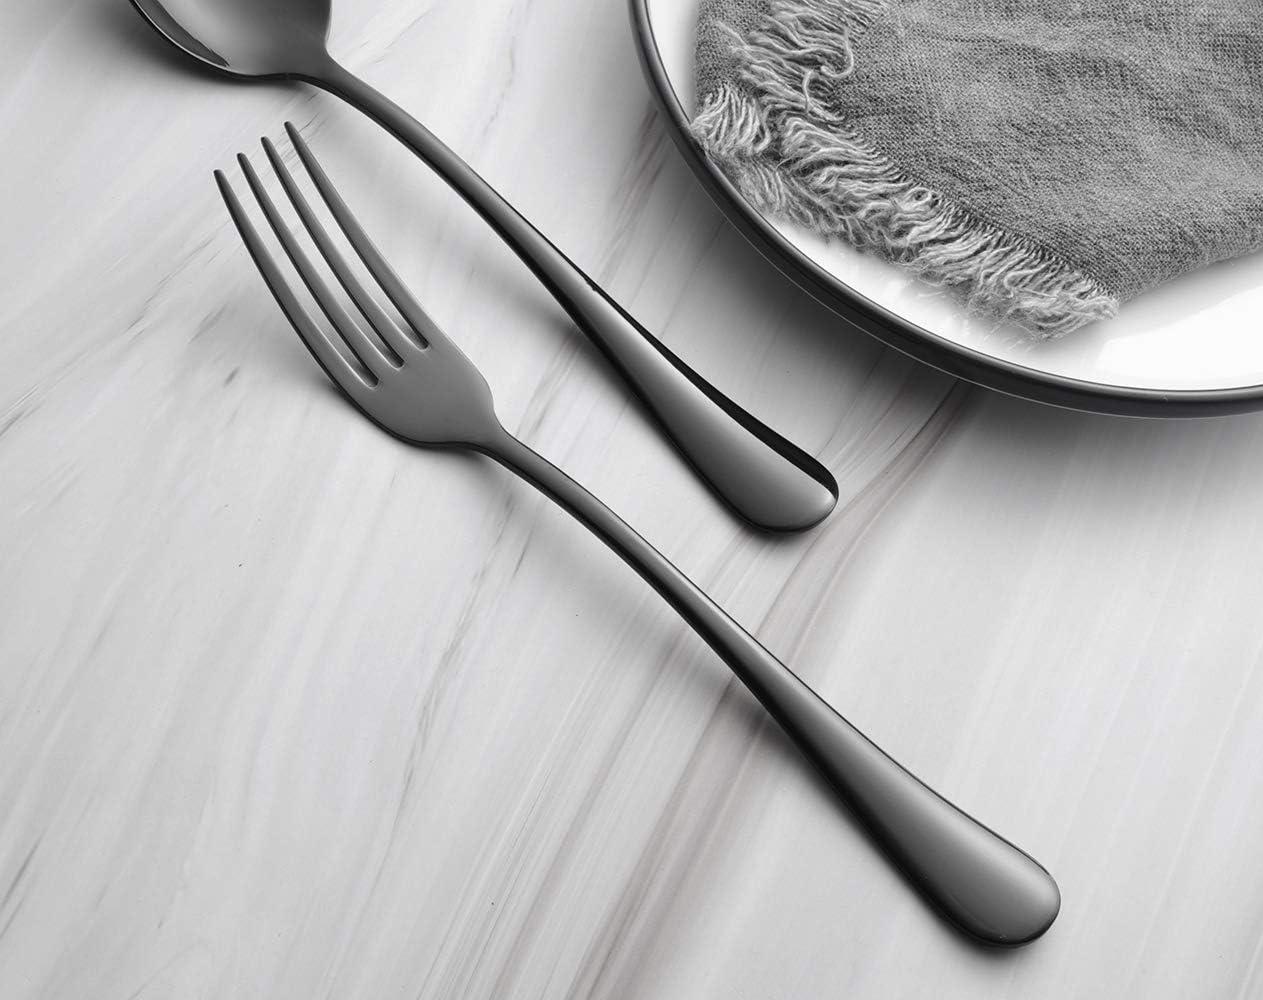 Dishwasher Safe Mirror Polishing Black Heavy Dinner Forks Set of 6 Black Stainless Steel 18//10 Flatware Silverware 7.95-Inch Table Forks 6-Piece